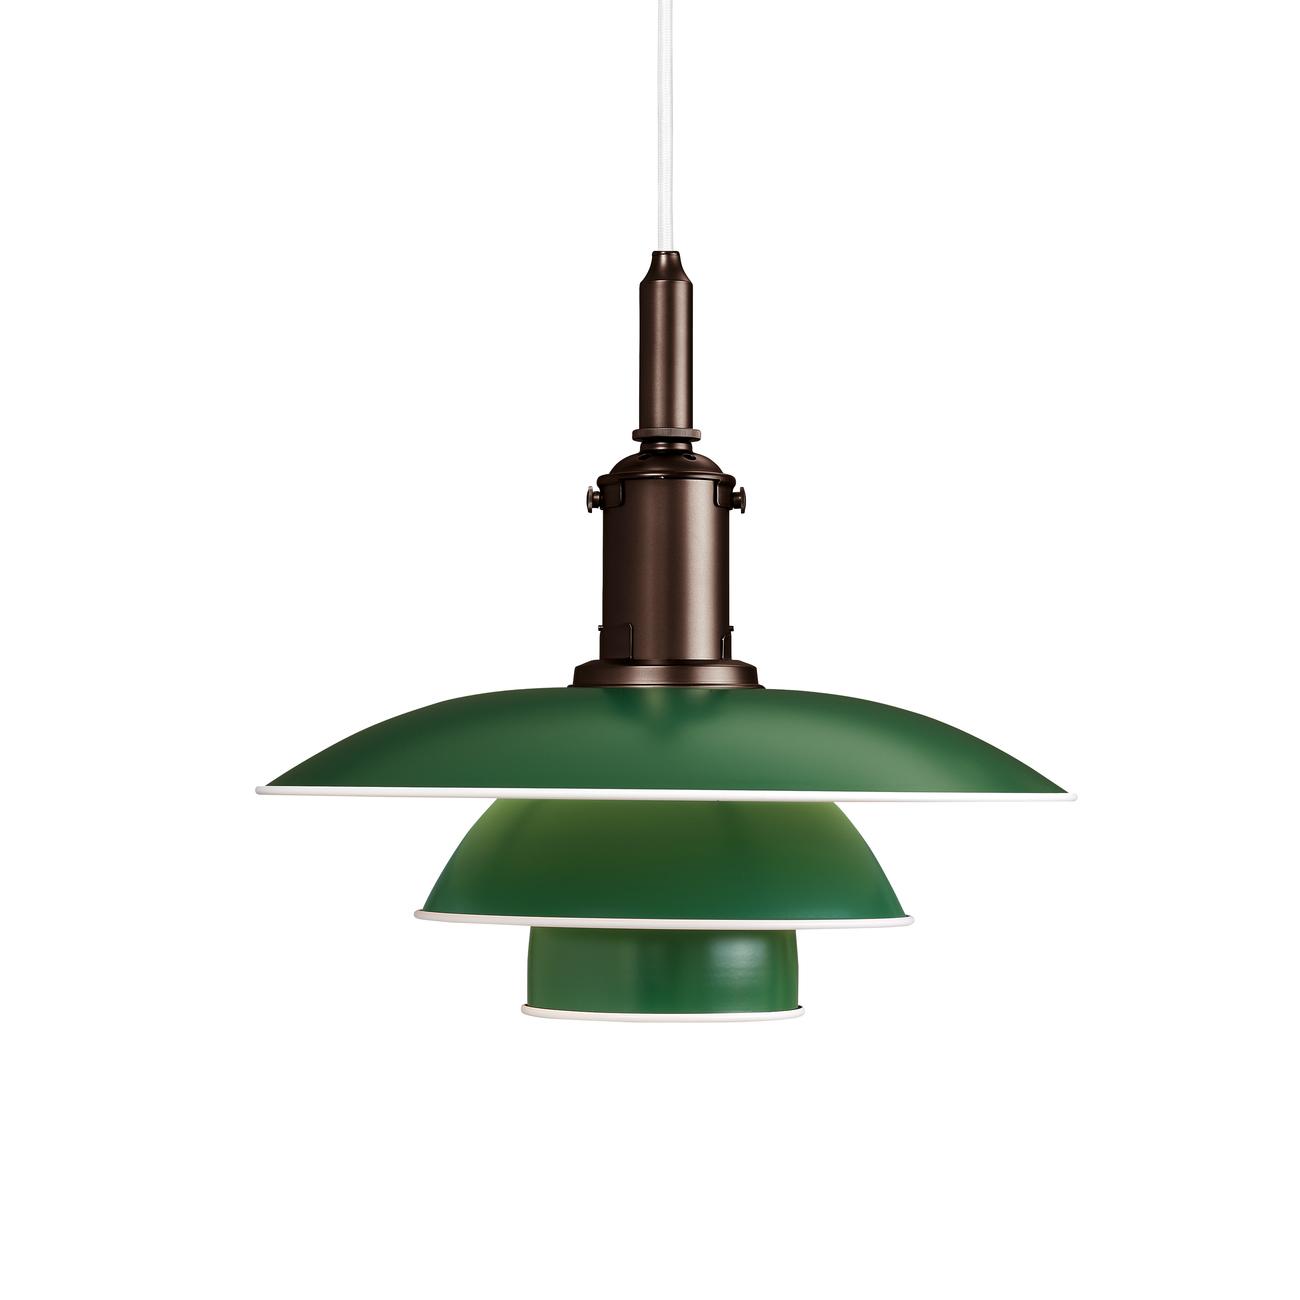 Louis Poulsen 3 1/2 - 3 Hanglamp-Groen